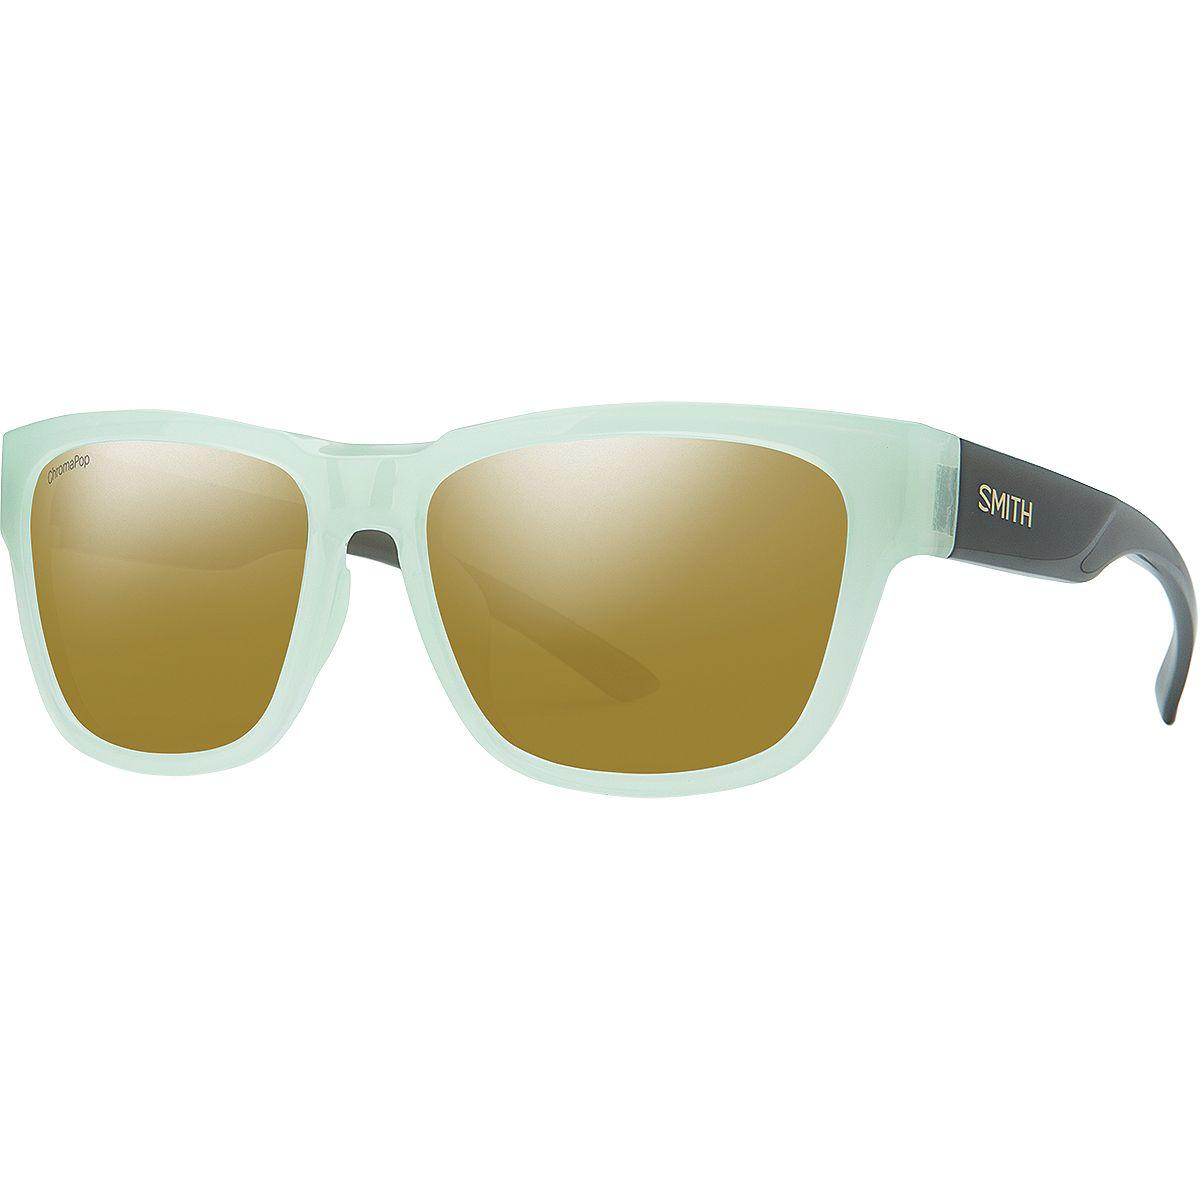 d3ef86c99fb4 Smith - Multicolor Ember Chromapop Polarized Sunglasses for Men - Lyst.  View fullscreen